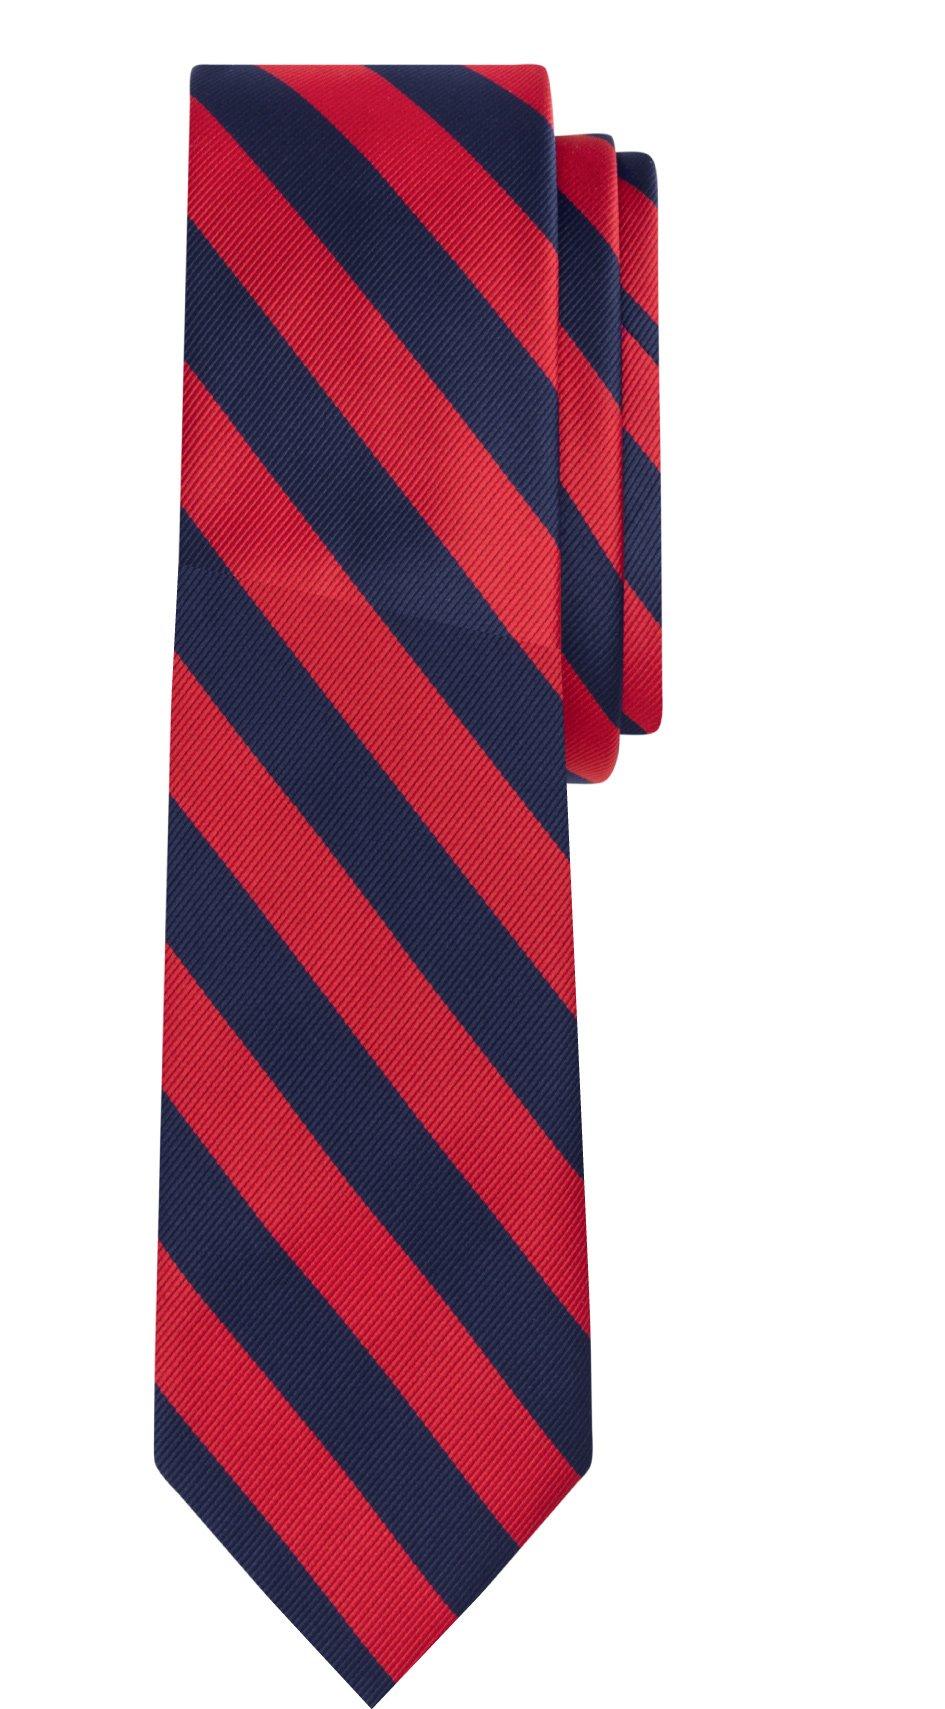 Jacob Alexander Stripe Woven Boys Regular College Striped Tie - Red Navy